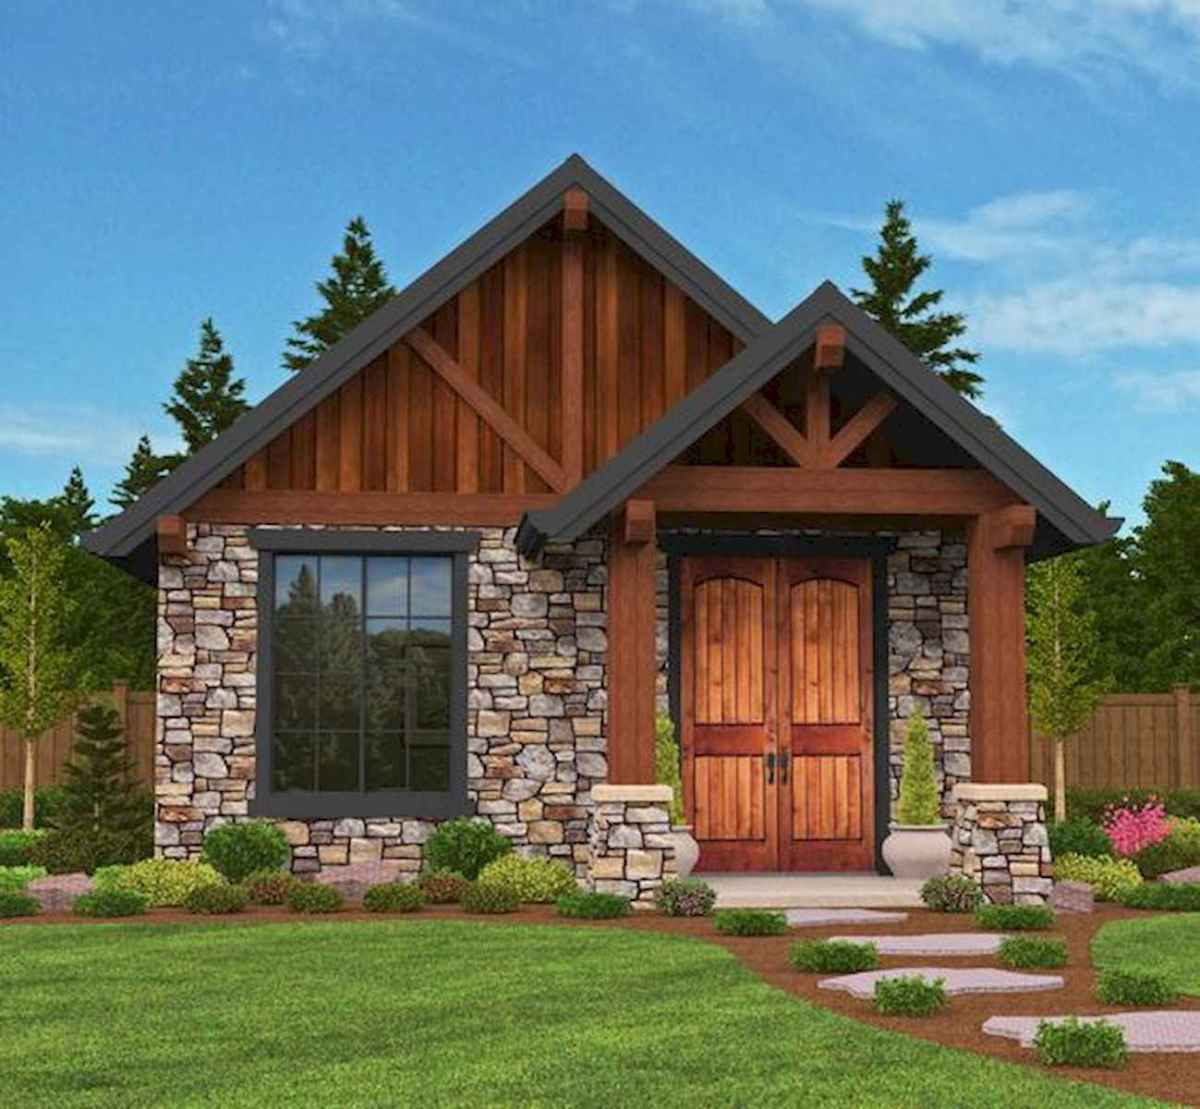 70 Suprising Small Log Cabin Homes Design Ideas (47)